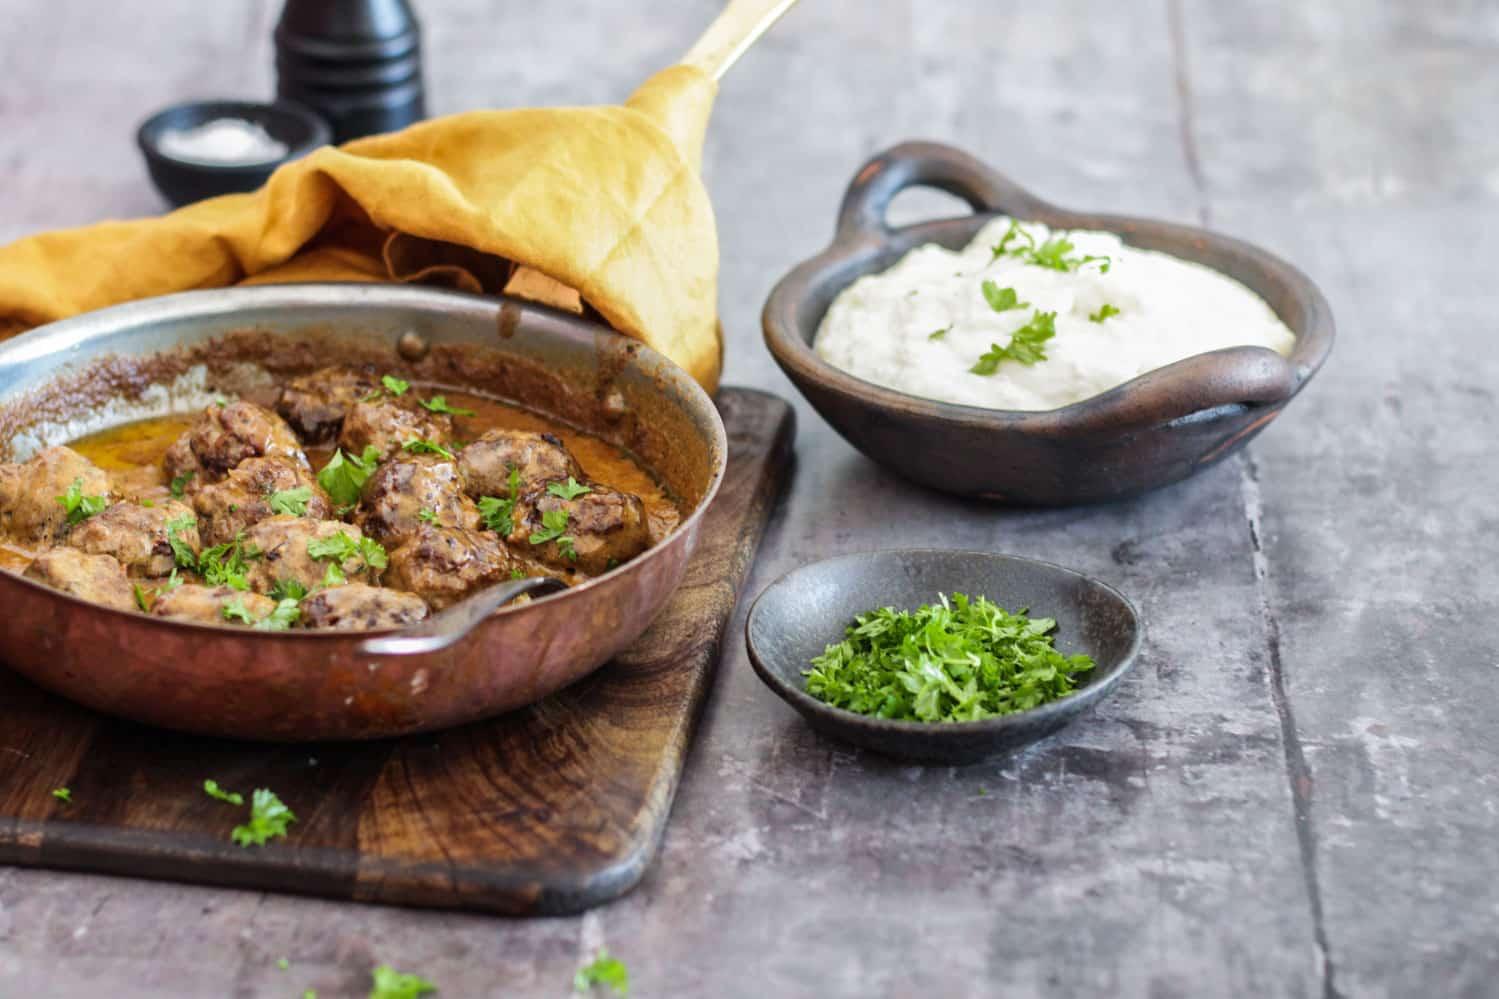 Svenske kødboller eller 'köttbullar' med brun sovs og blomkålsmos. Dejlig familiemad, som alle kan lide.